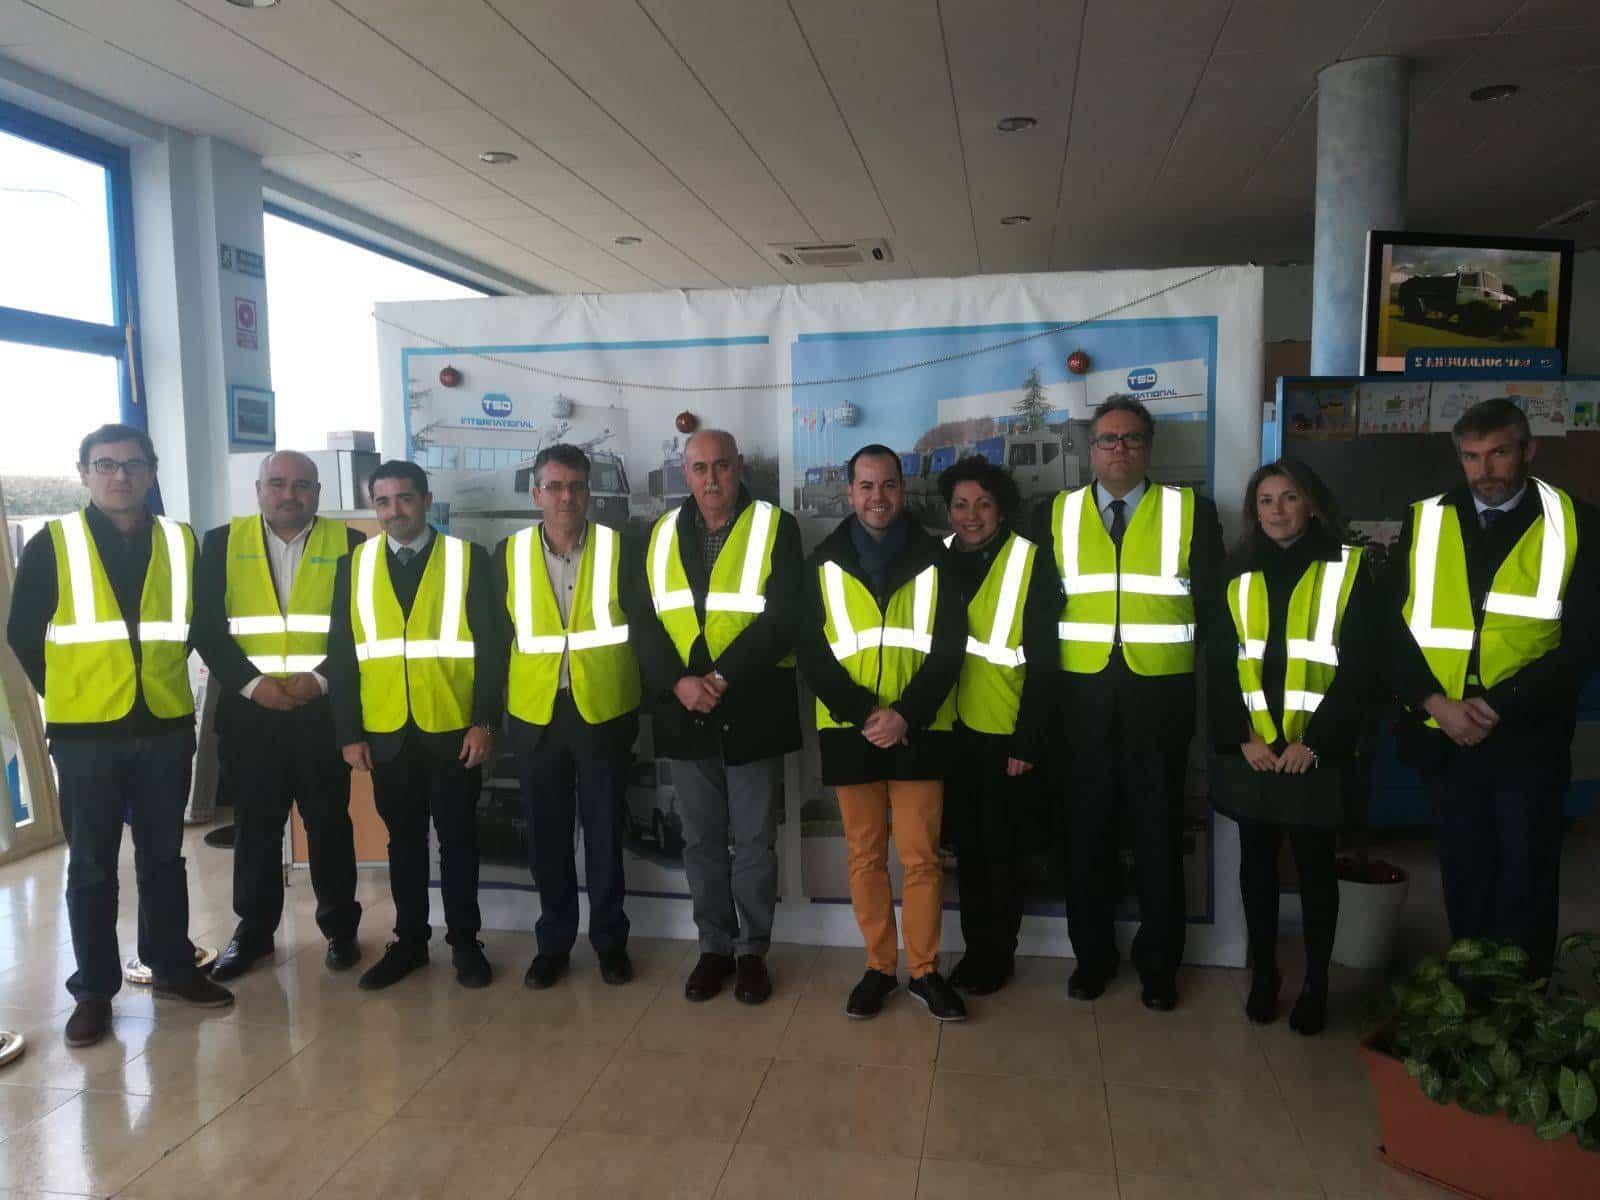 Director General de Empleo visitó TSD-DIVISEGUR en Herencia 5